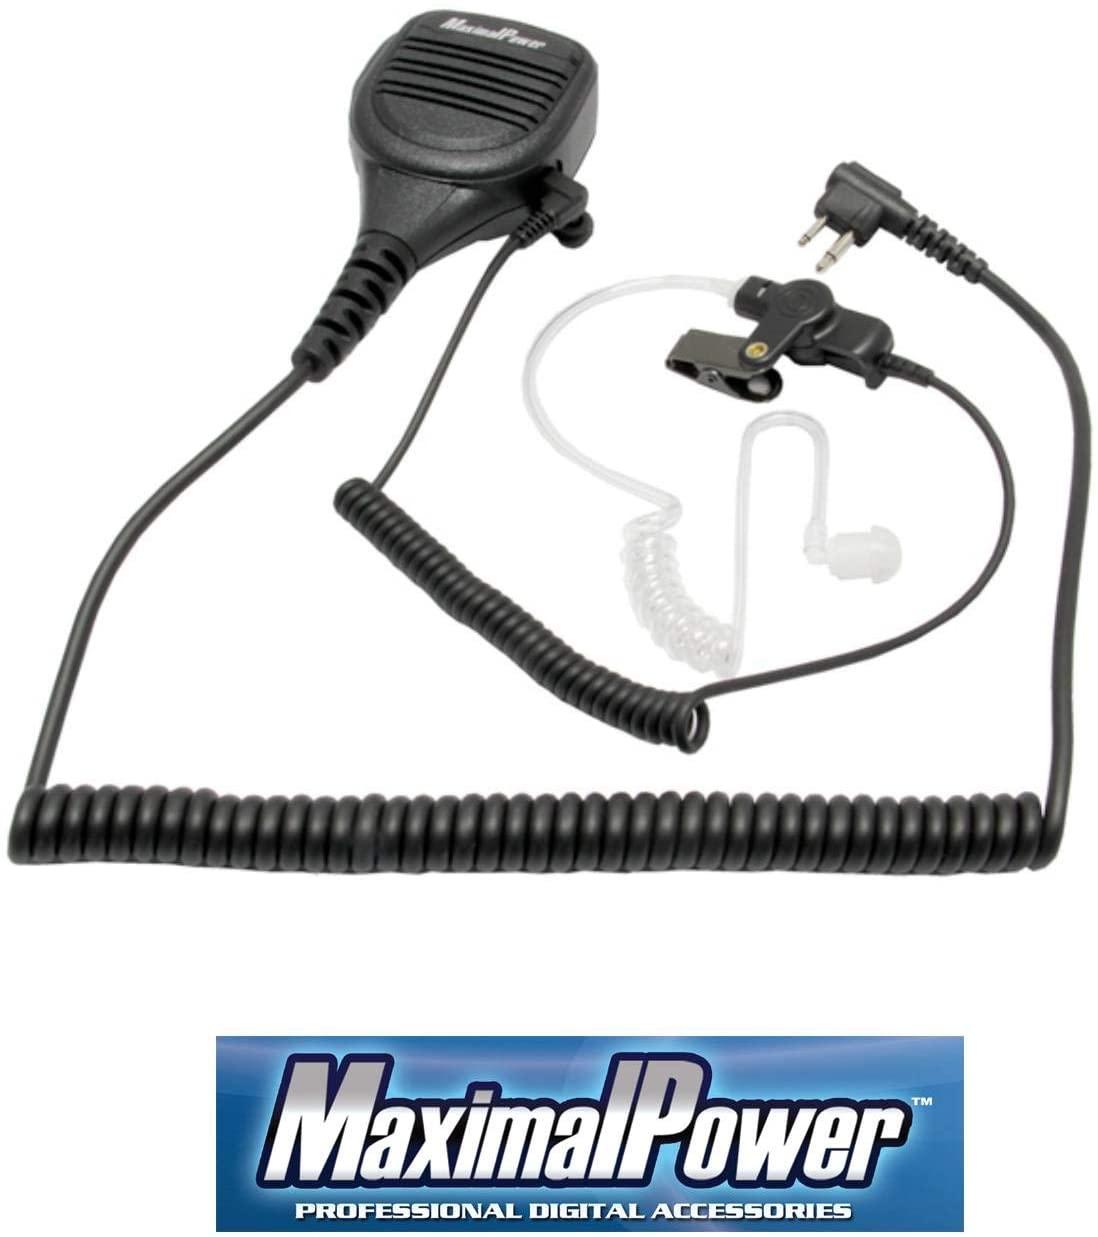 MaximalPower Speaker Mic with Clear Coil Cord Surveillance Earpiece for Motorola HMN9030 GP300 CP200 XLS PR400 EP450 GTX GP300 P1225 CP185 P110 SP50